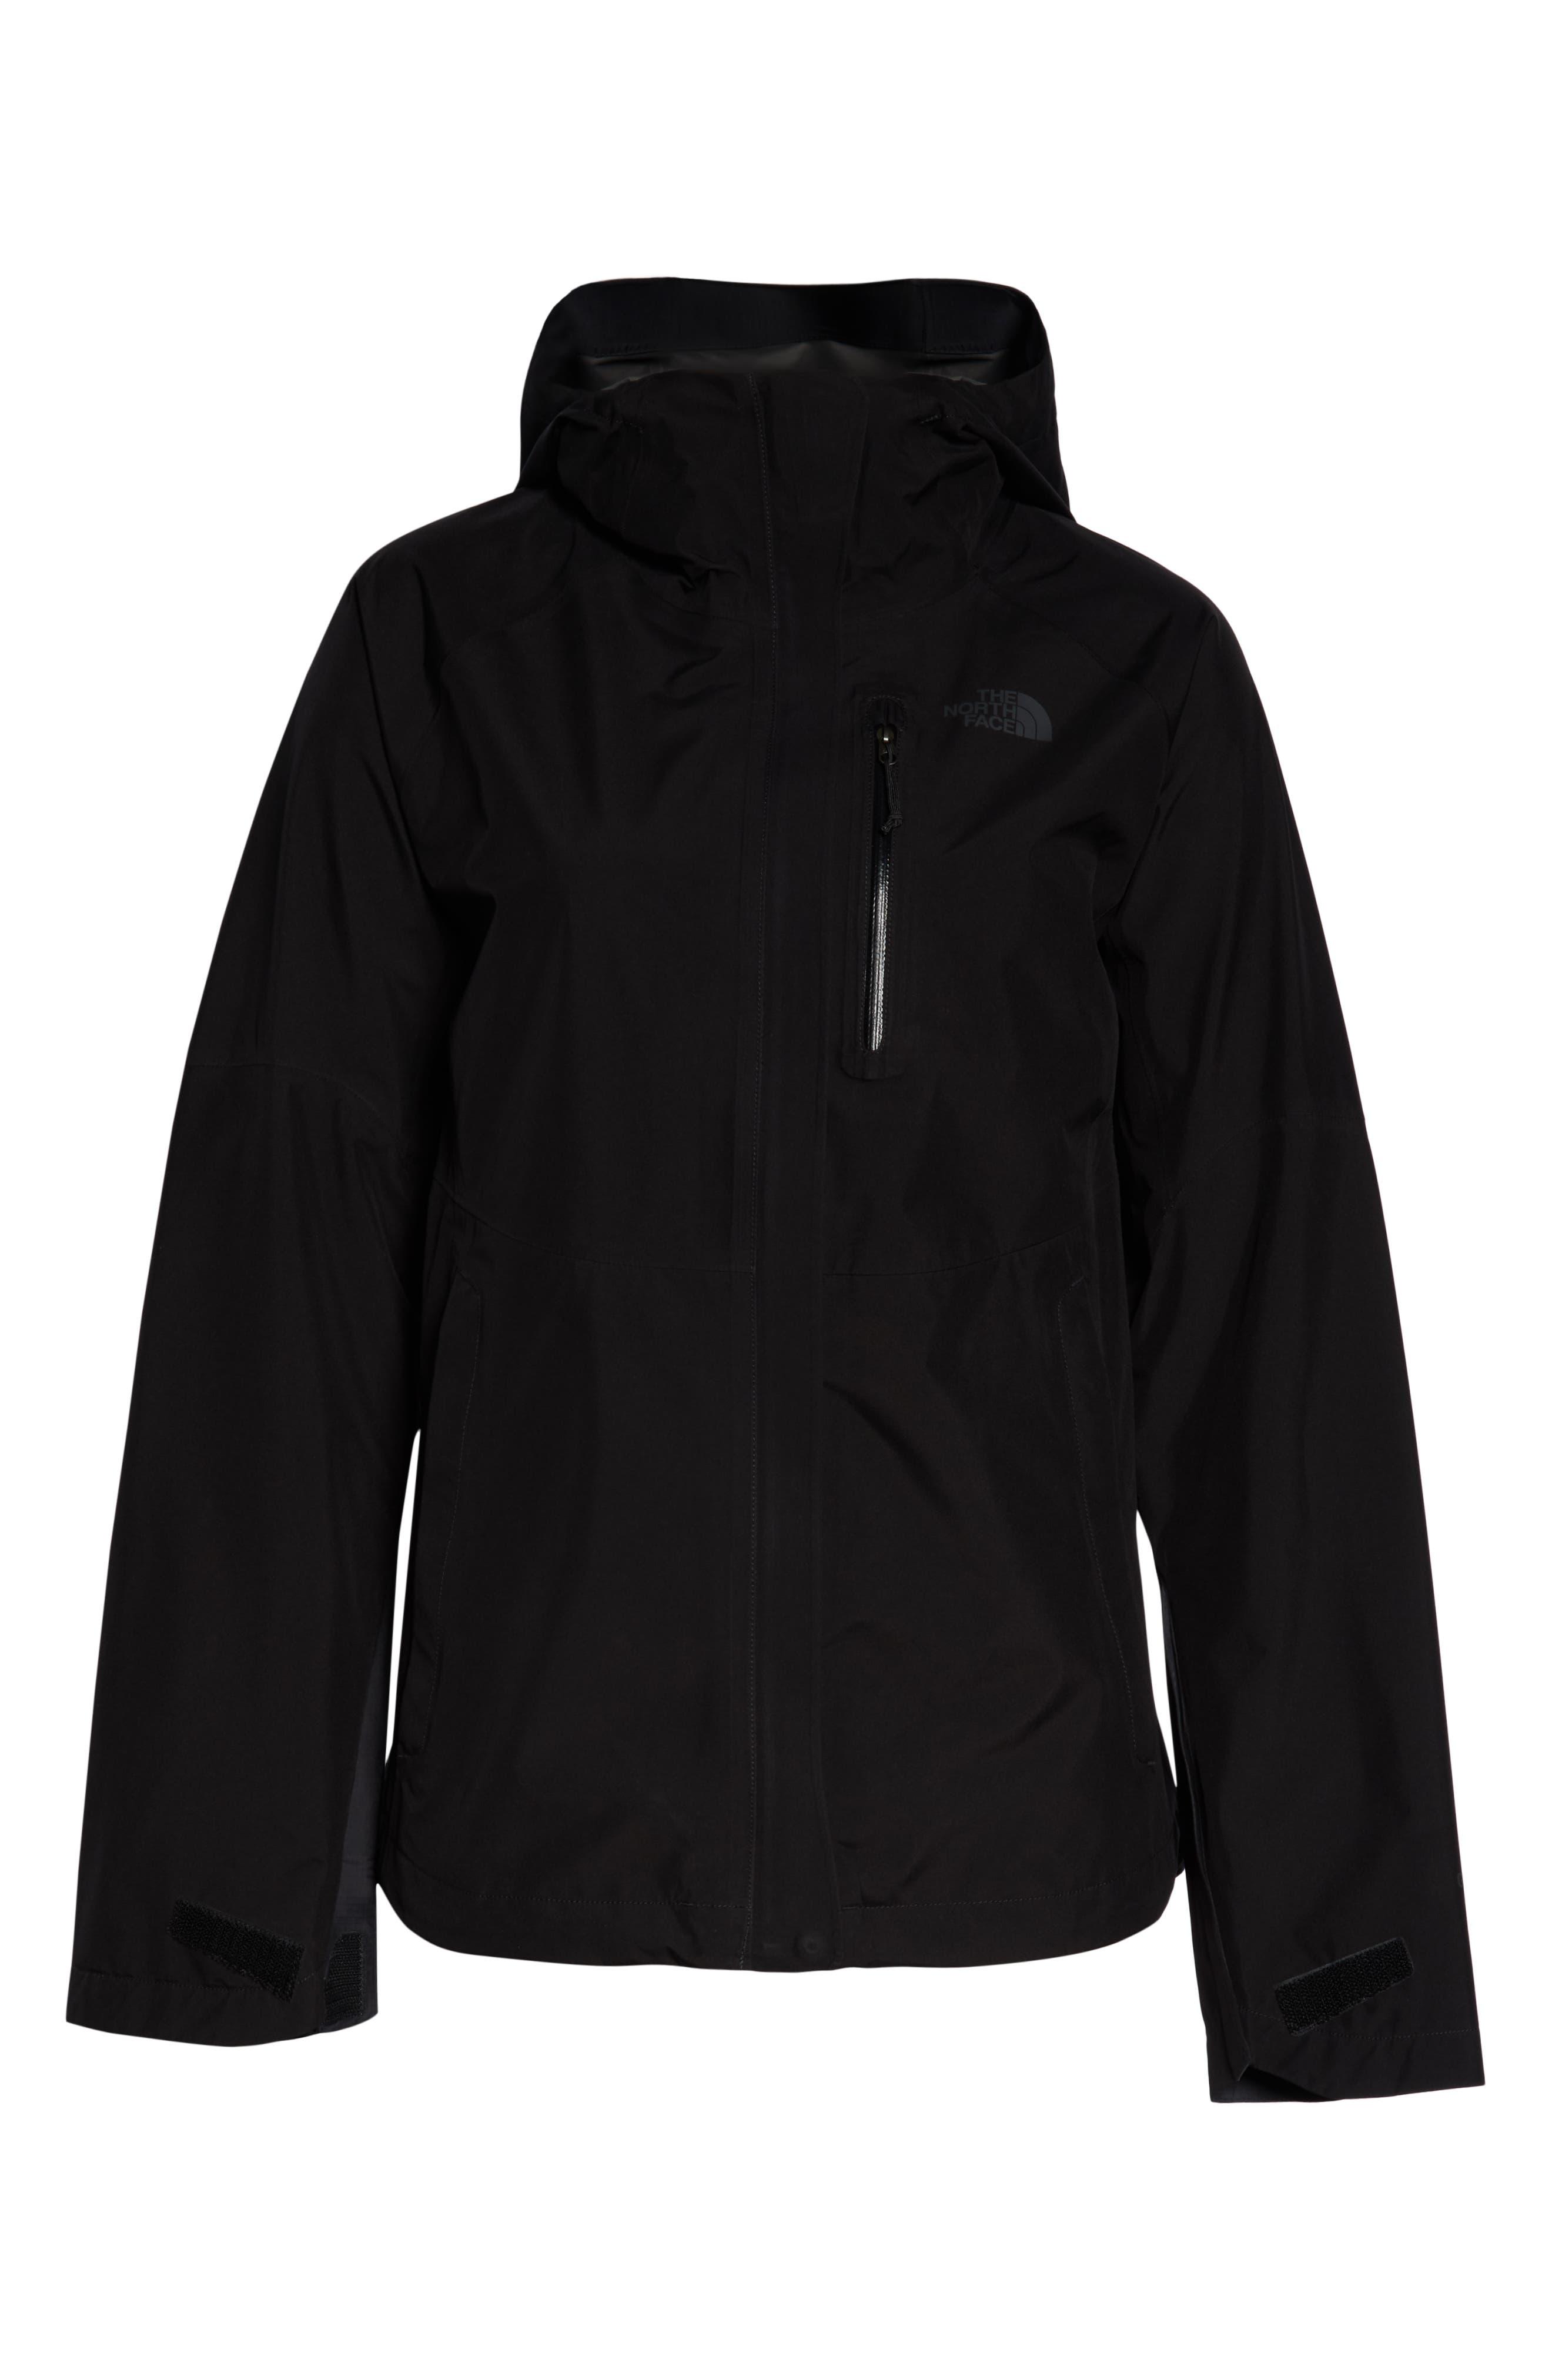 THE NORTH FACE, Dryzzle Hooded Rain Jacket, Alternate thumbnail 6, color, TNF BLACK